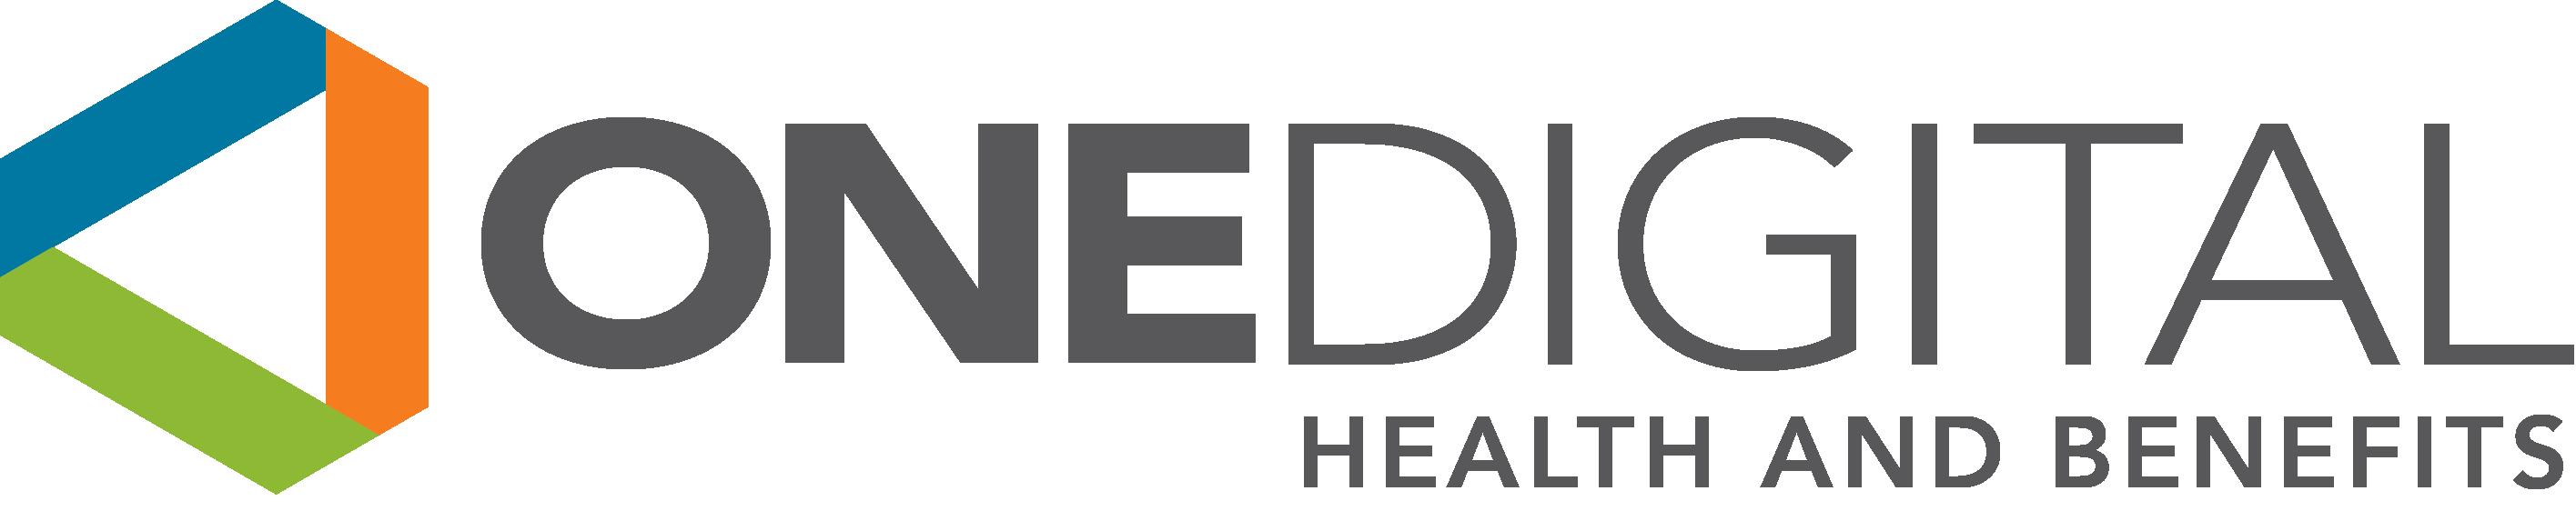 onedigital_logo_4color_HealthBenefitsTag - Copy